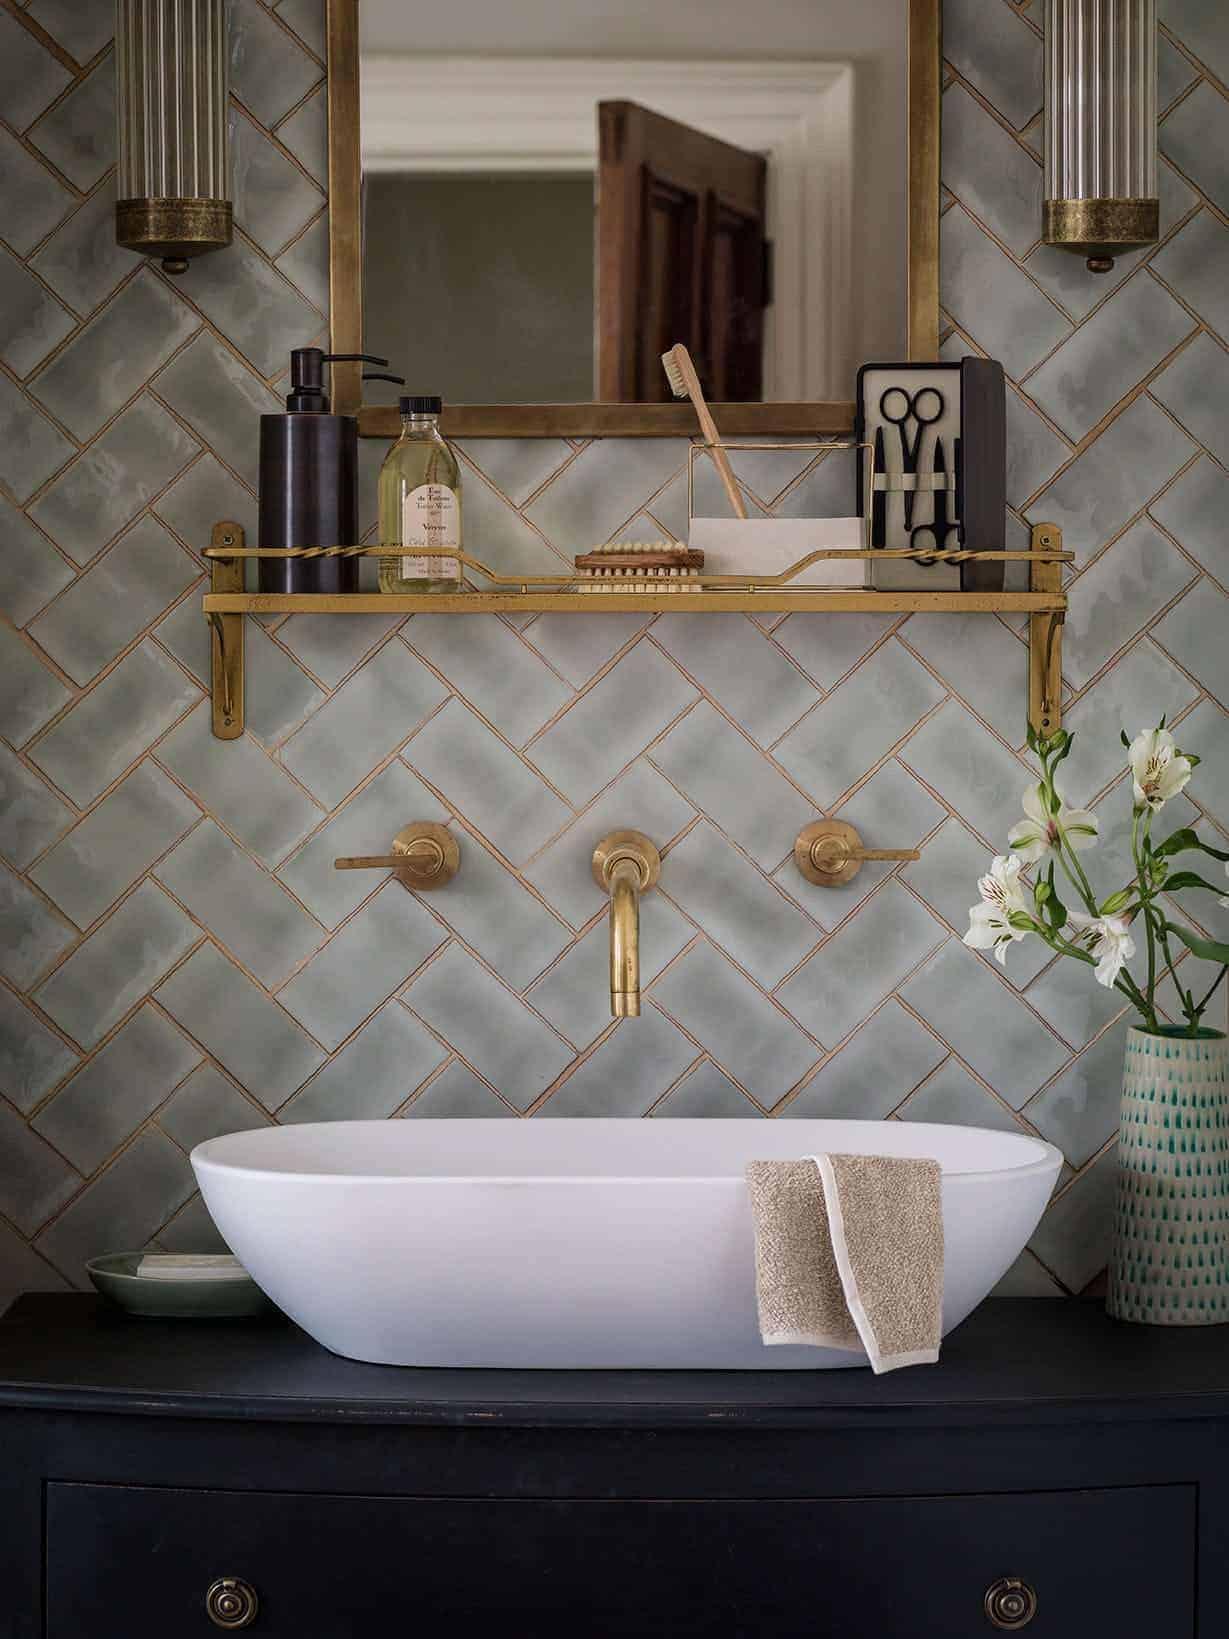 Emily Henderson Design Trends 2018 Bathroom Open Storage 02